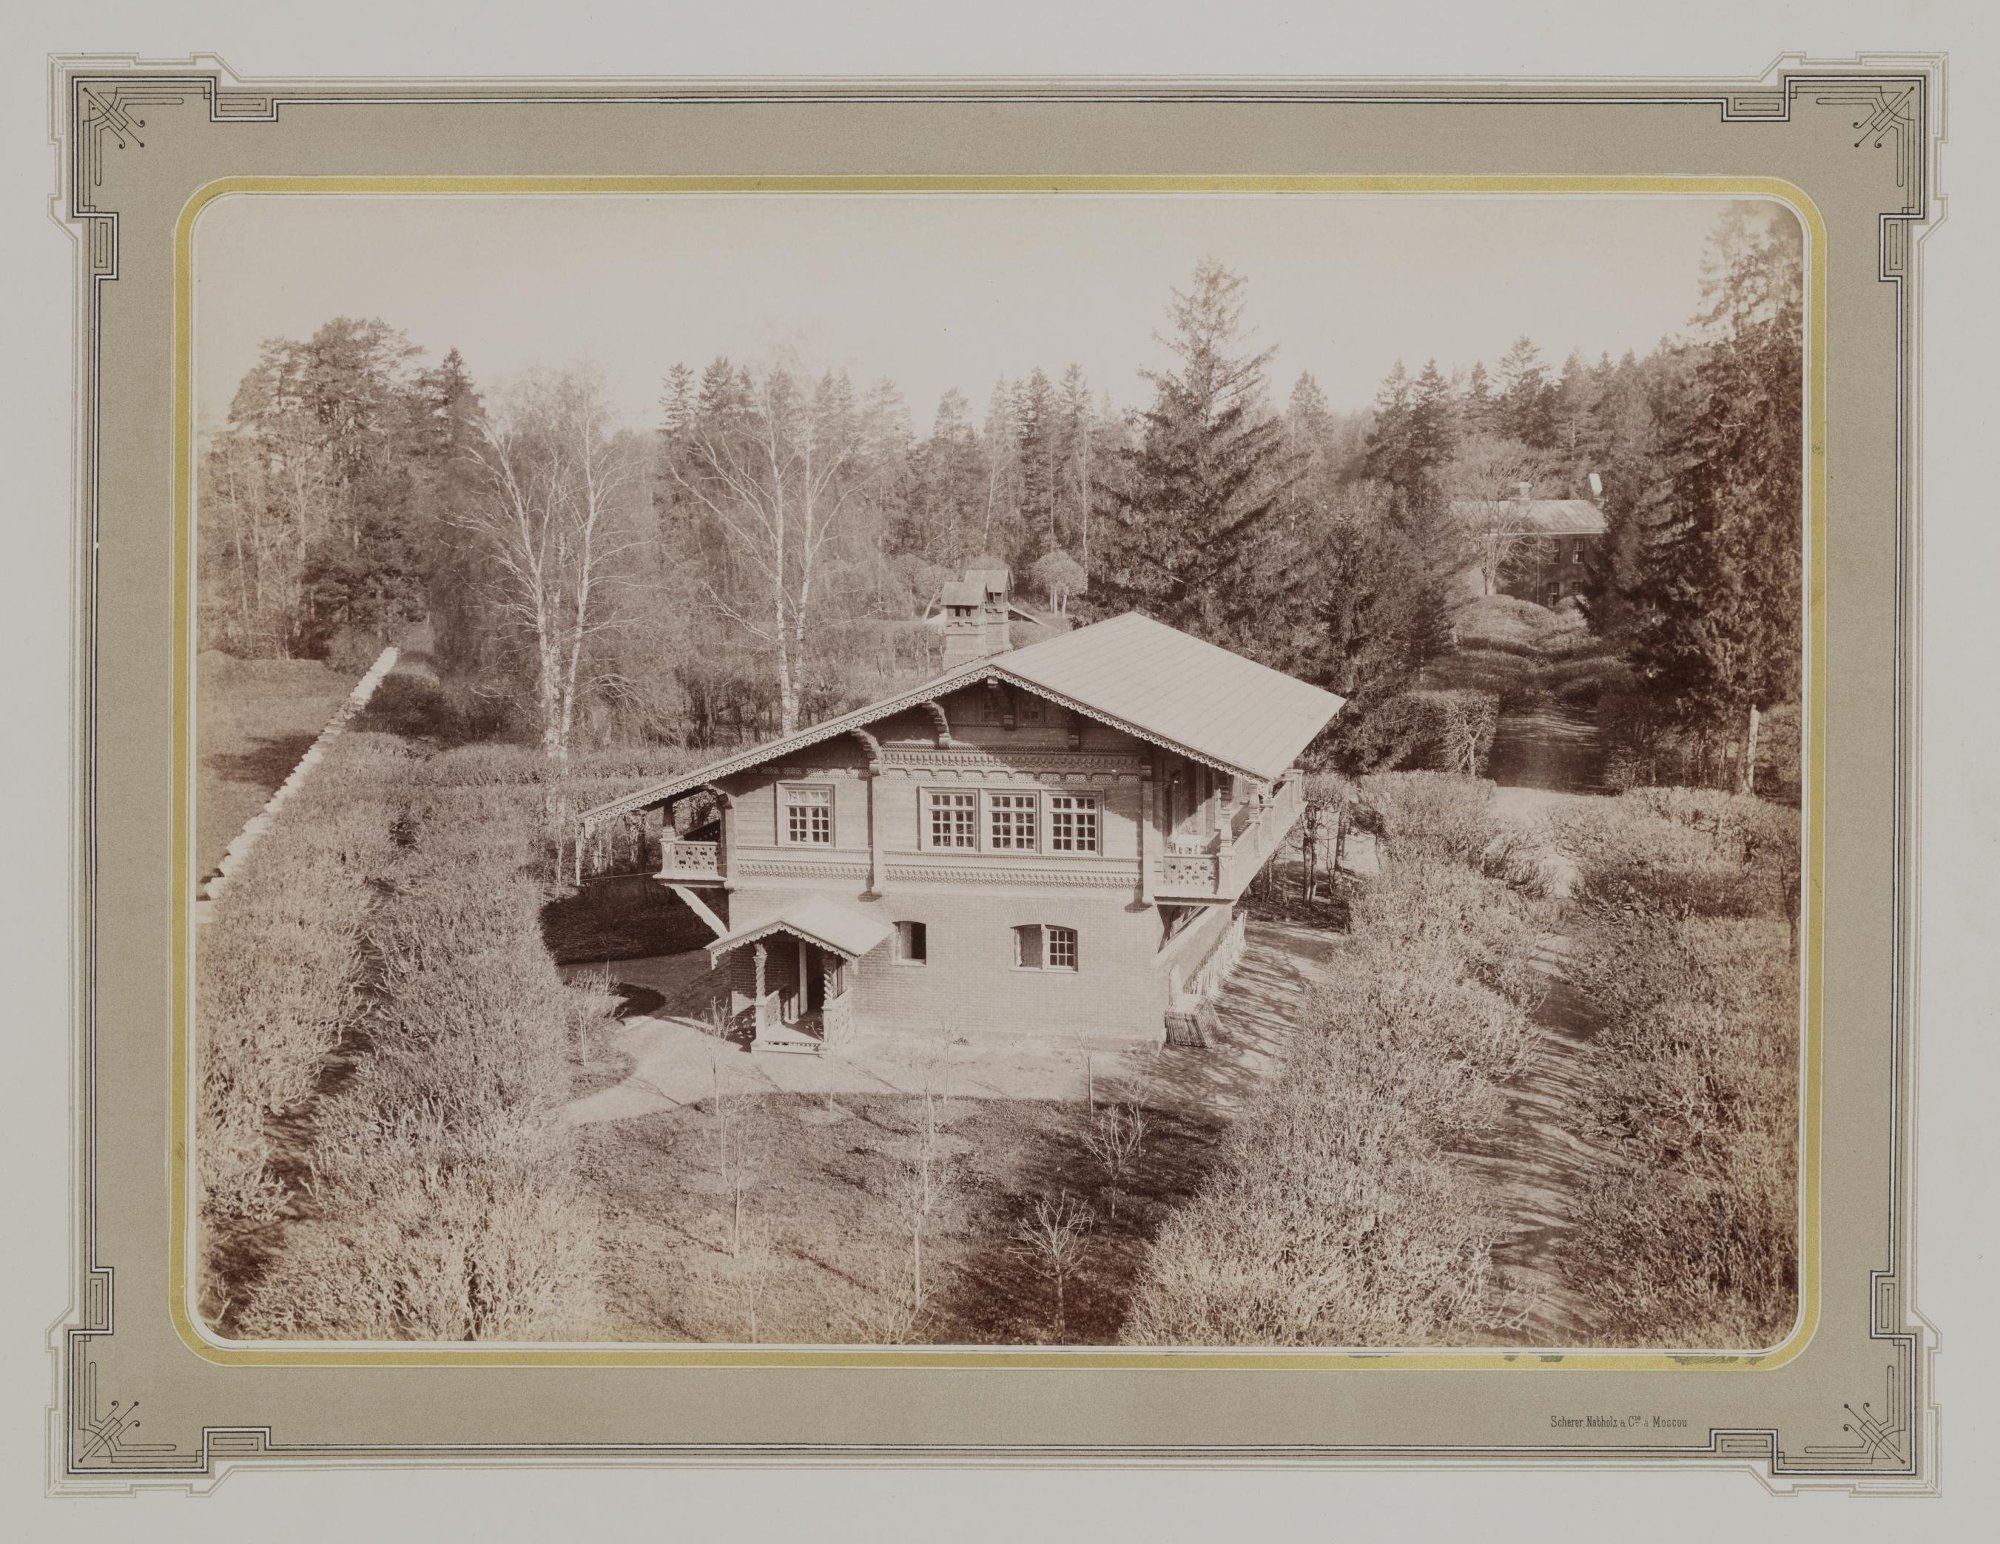 1883-1886. Усадьба Кусково. Швейцарский домик